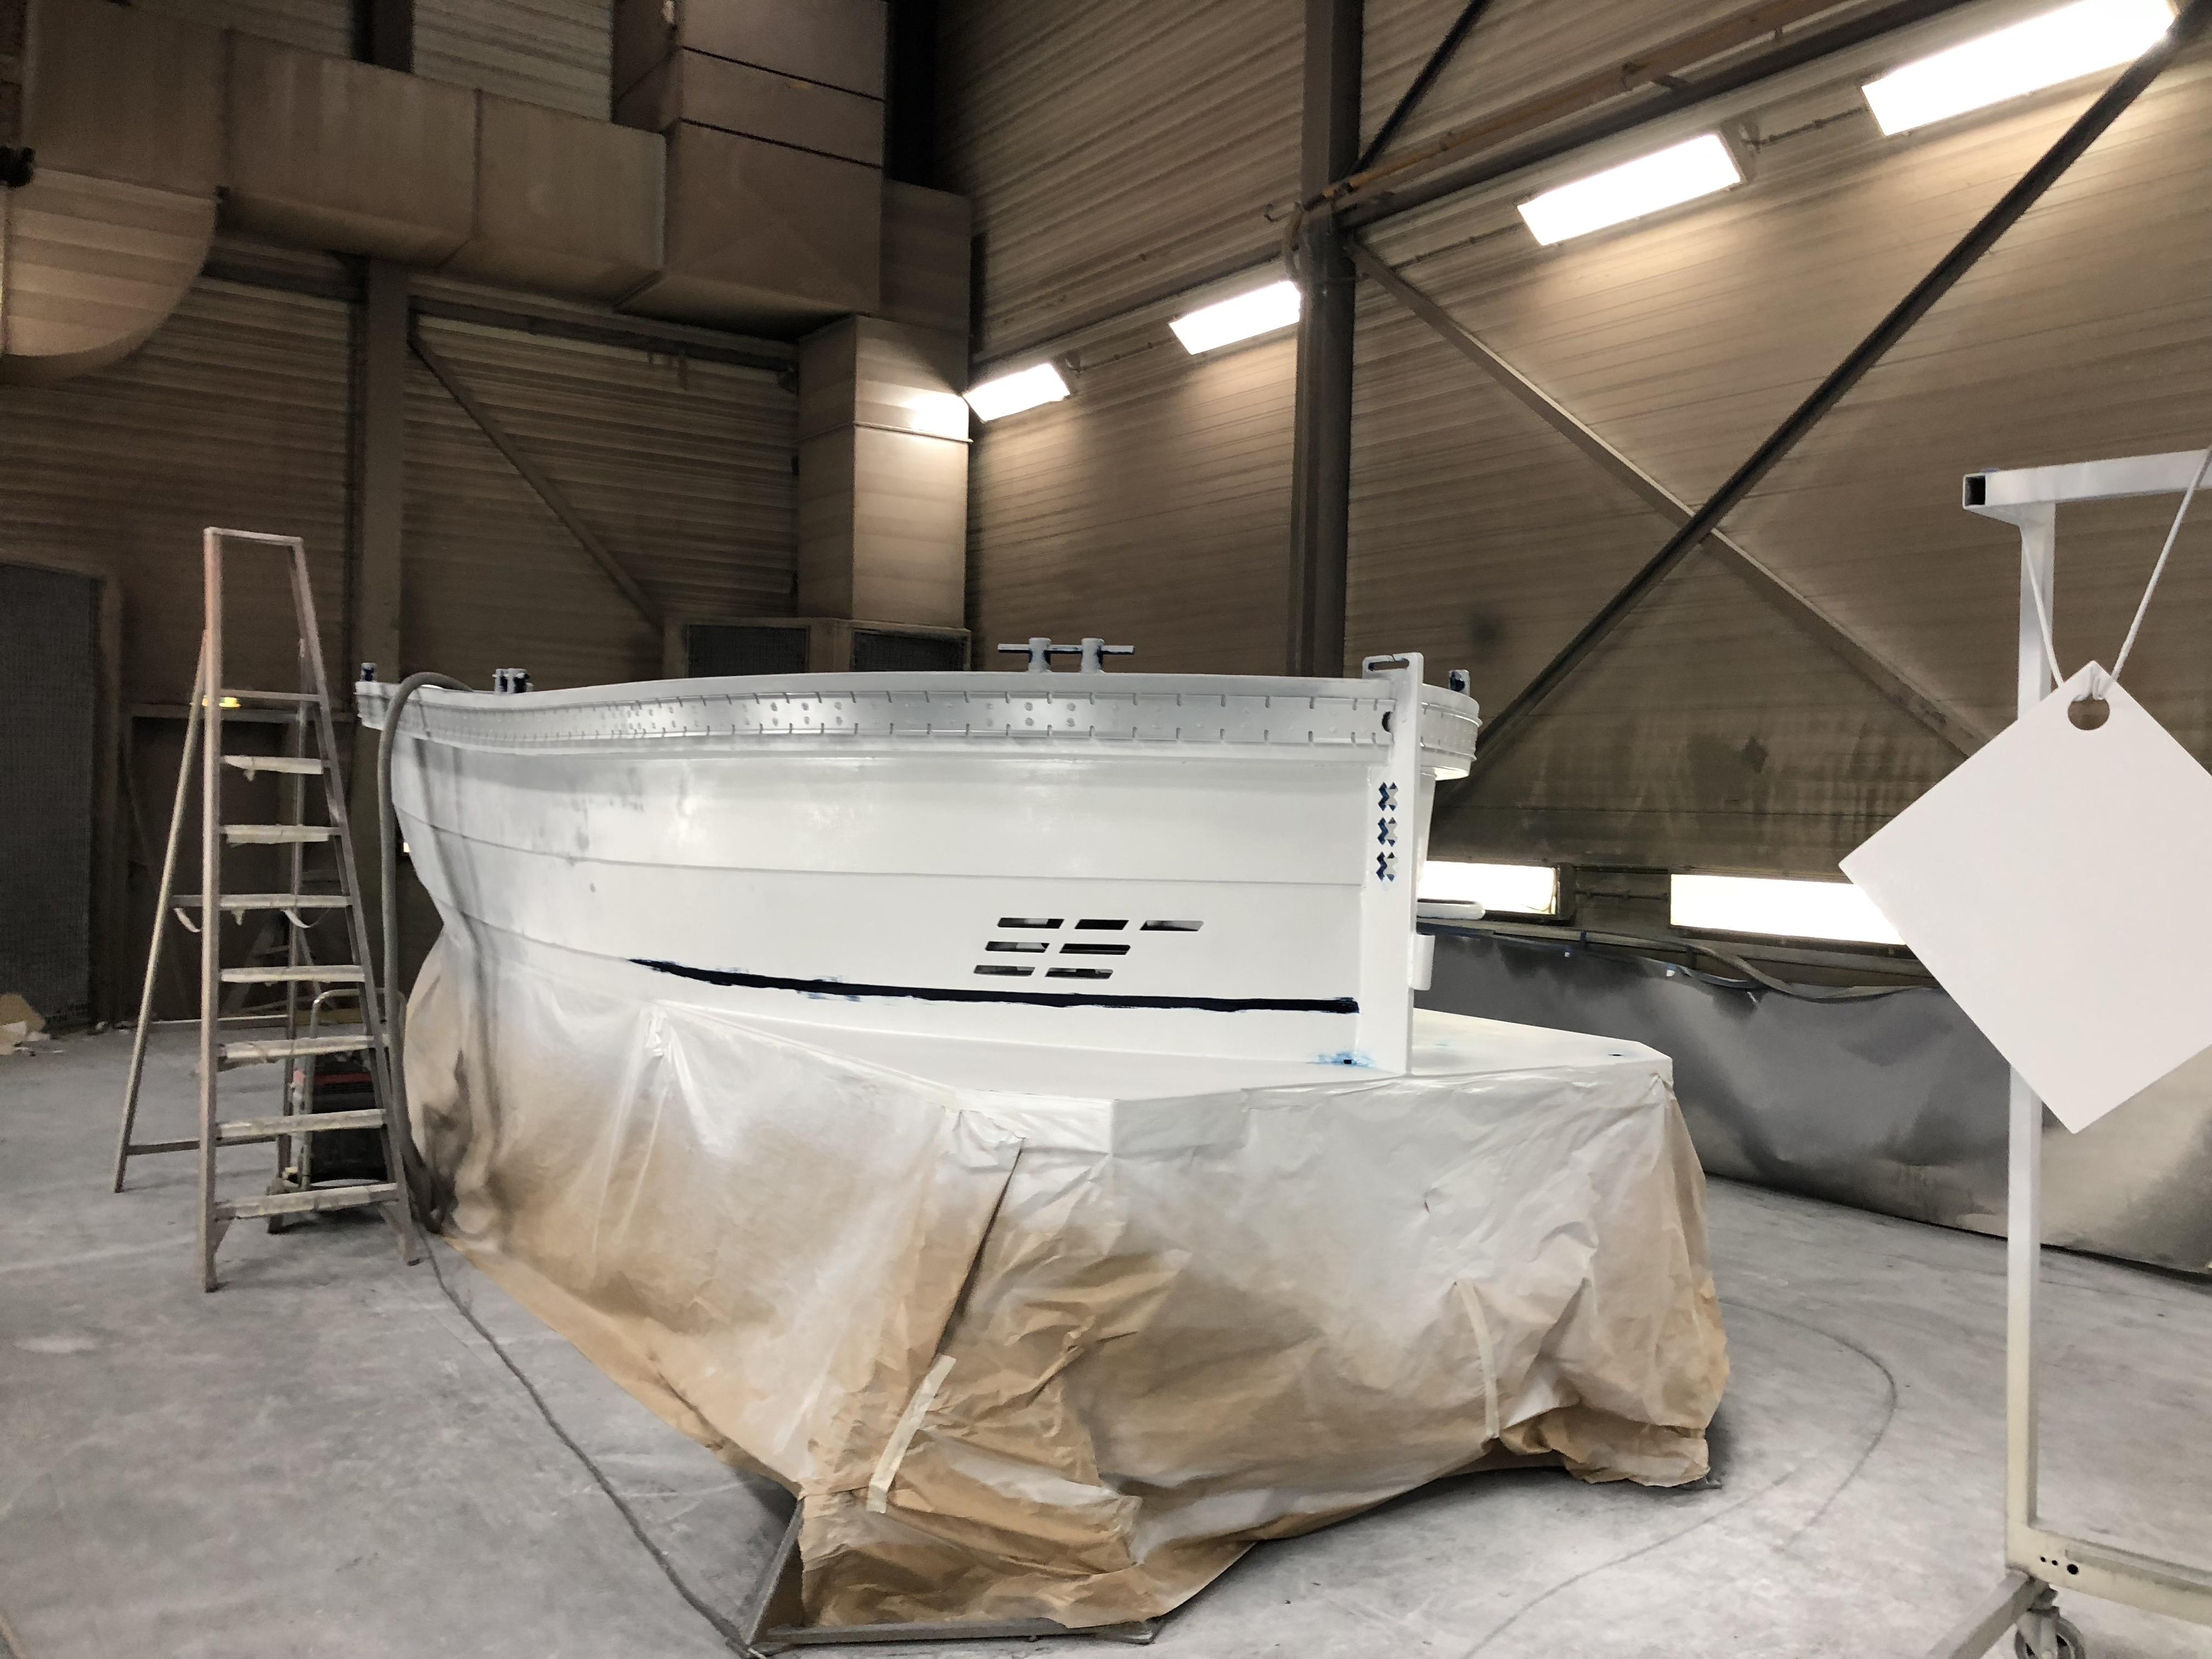 Lekker Boats coating by Van der Griend Spuiterijen